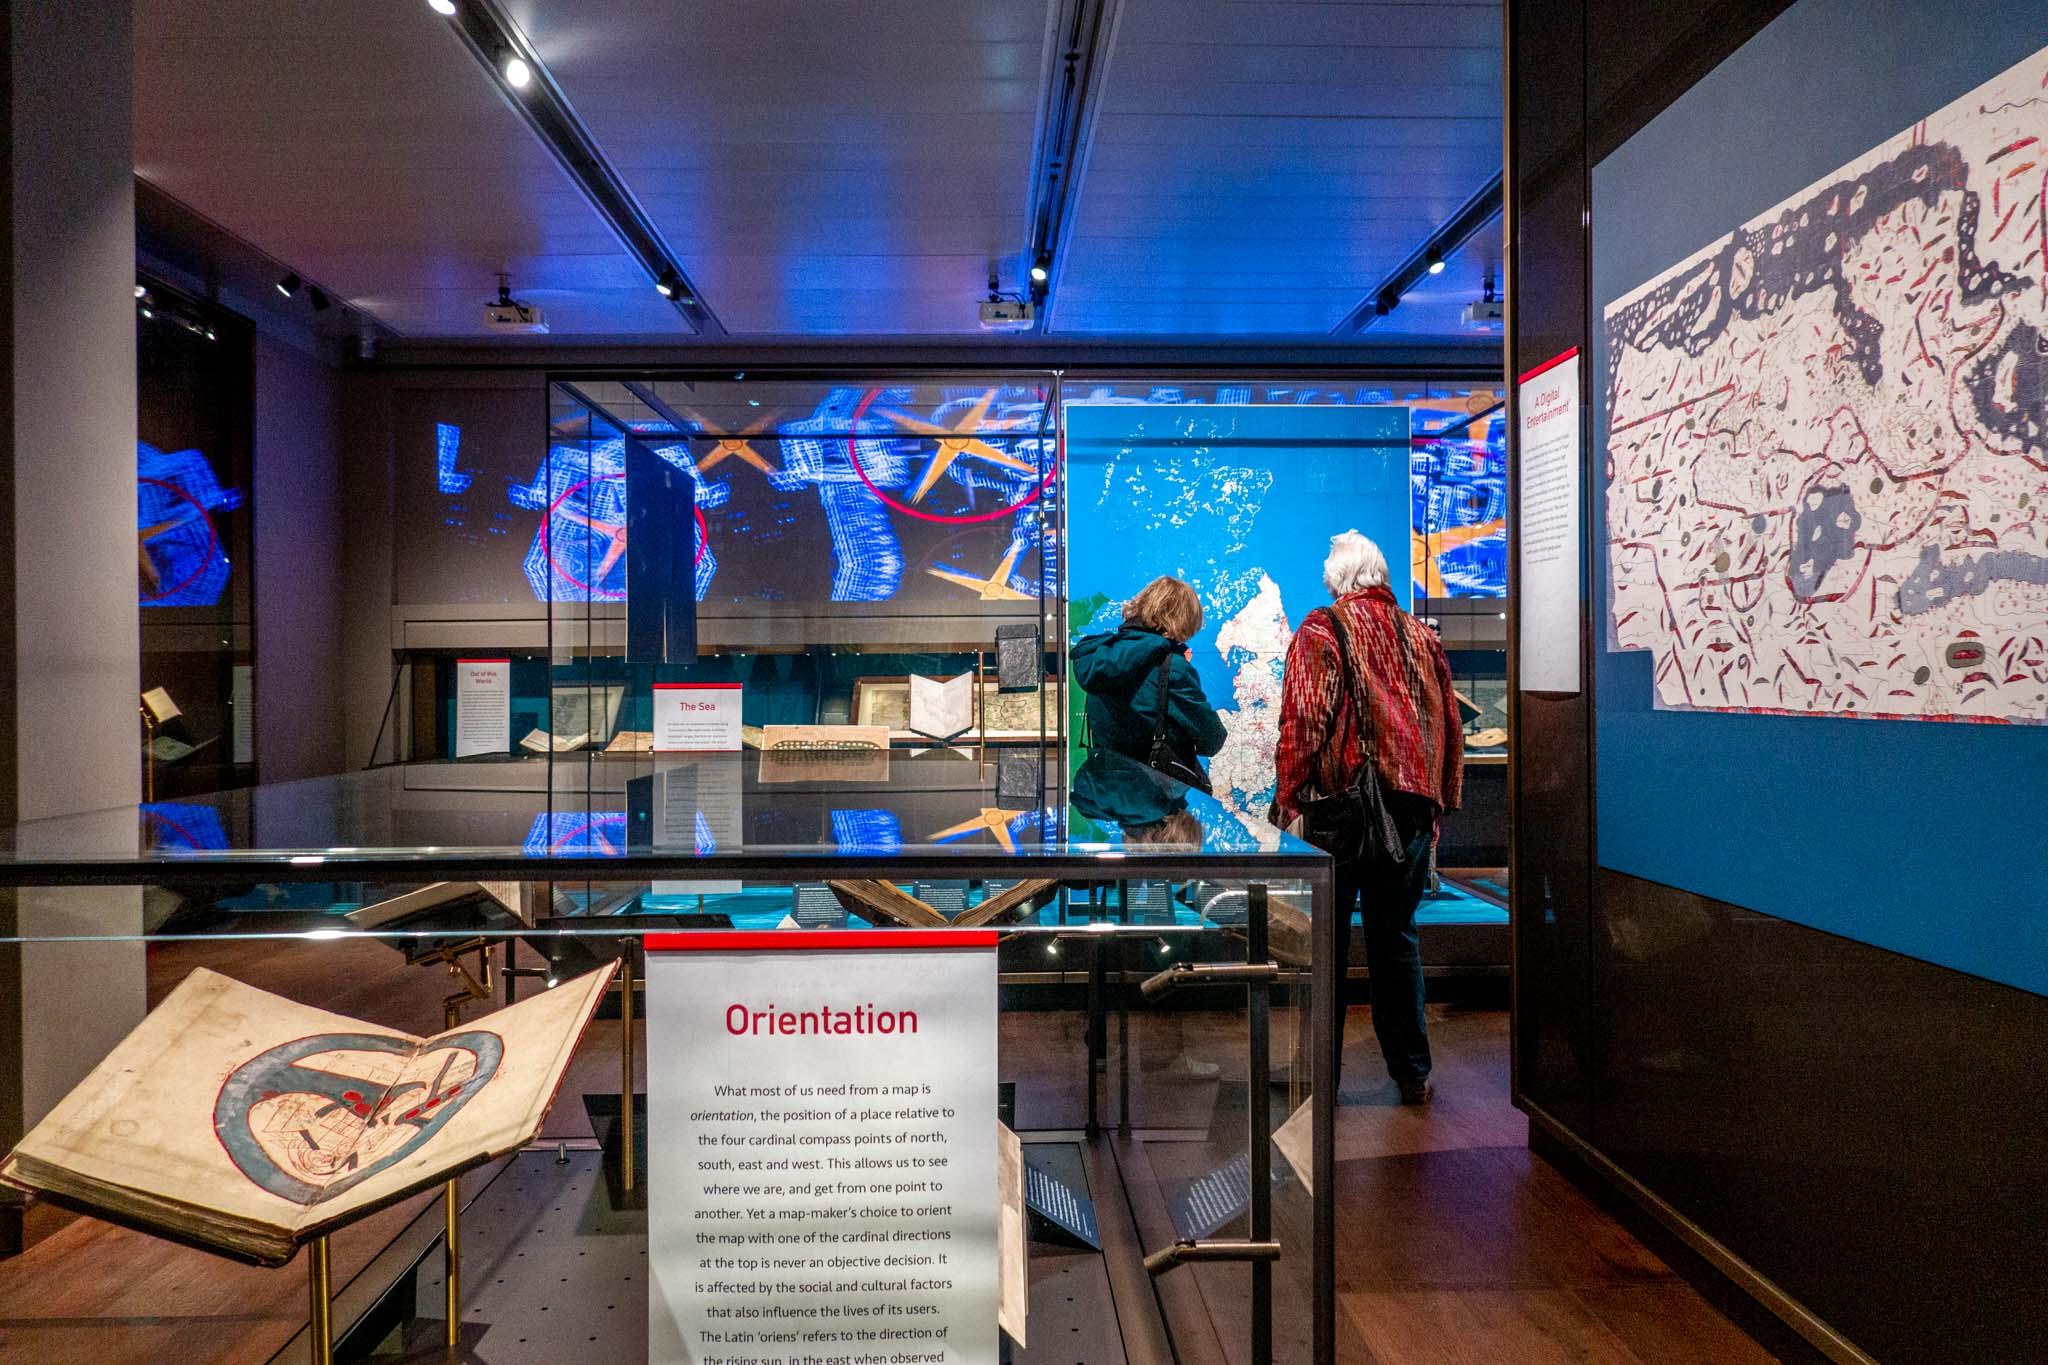 People reading display panels in exhibit rooms